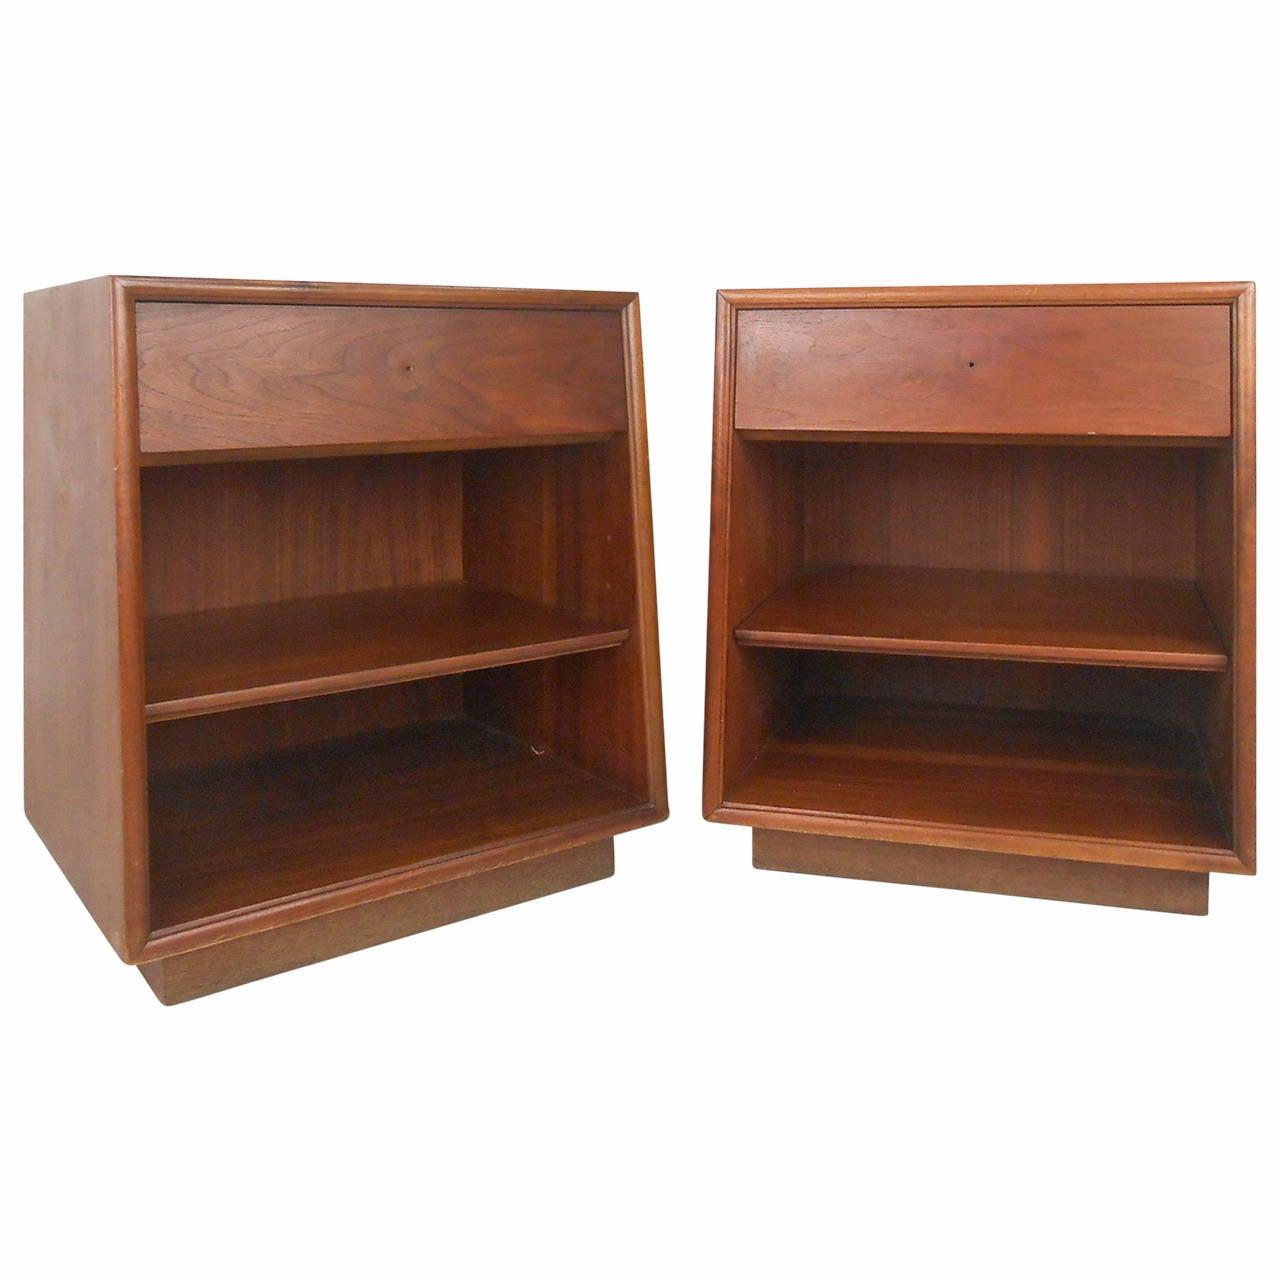 Pair of mid century modern nightstands by drexel for sale for Modern nightstands for sale